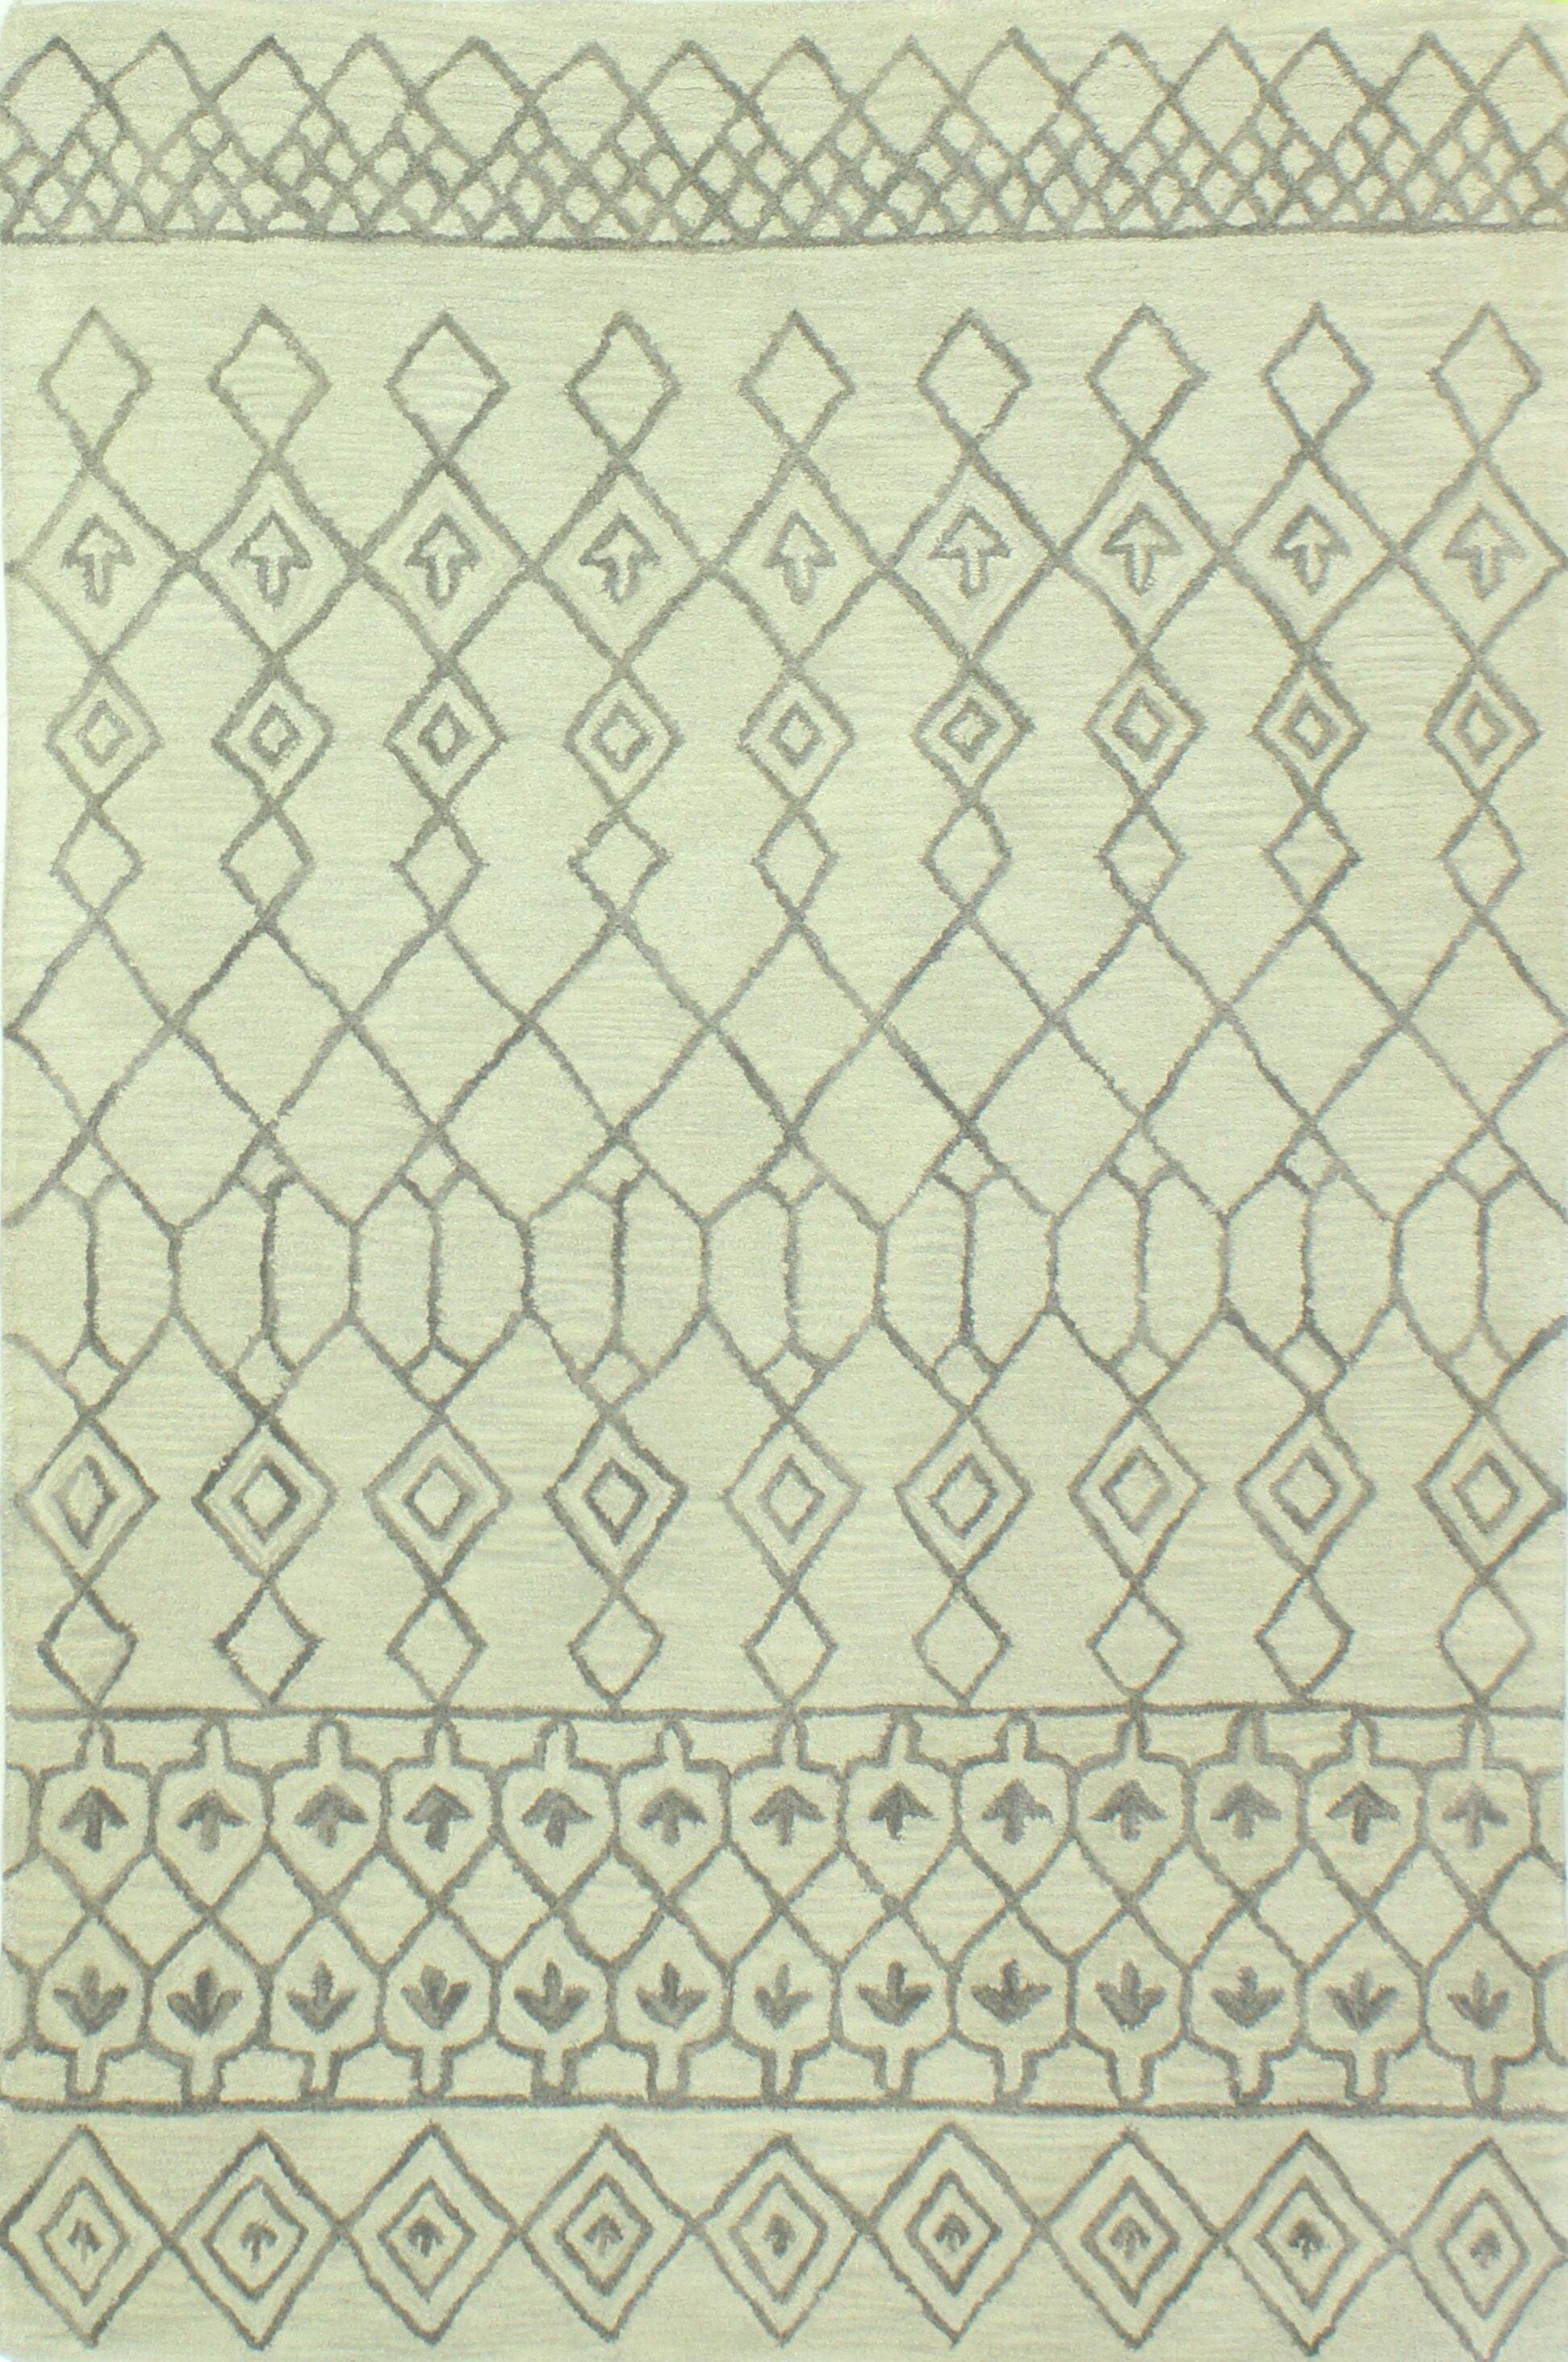 Bielecki Hand-Tufted Area Rug Rug Size: 8'6